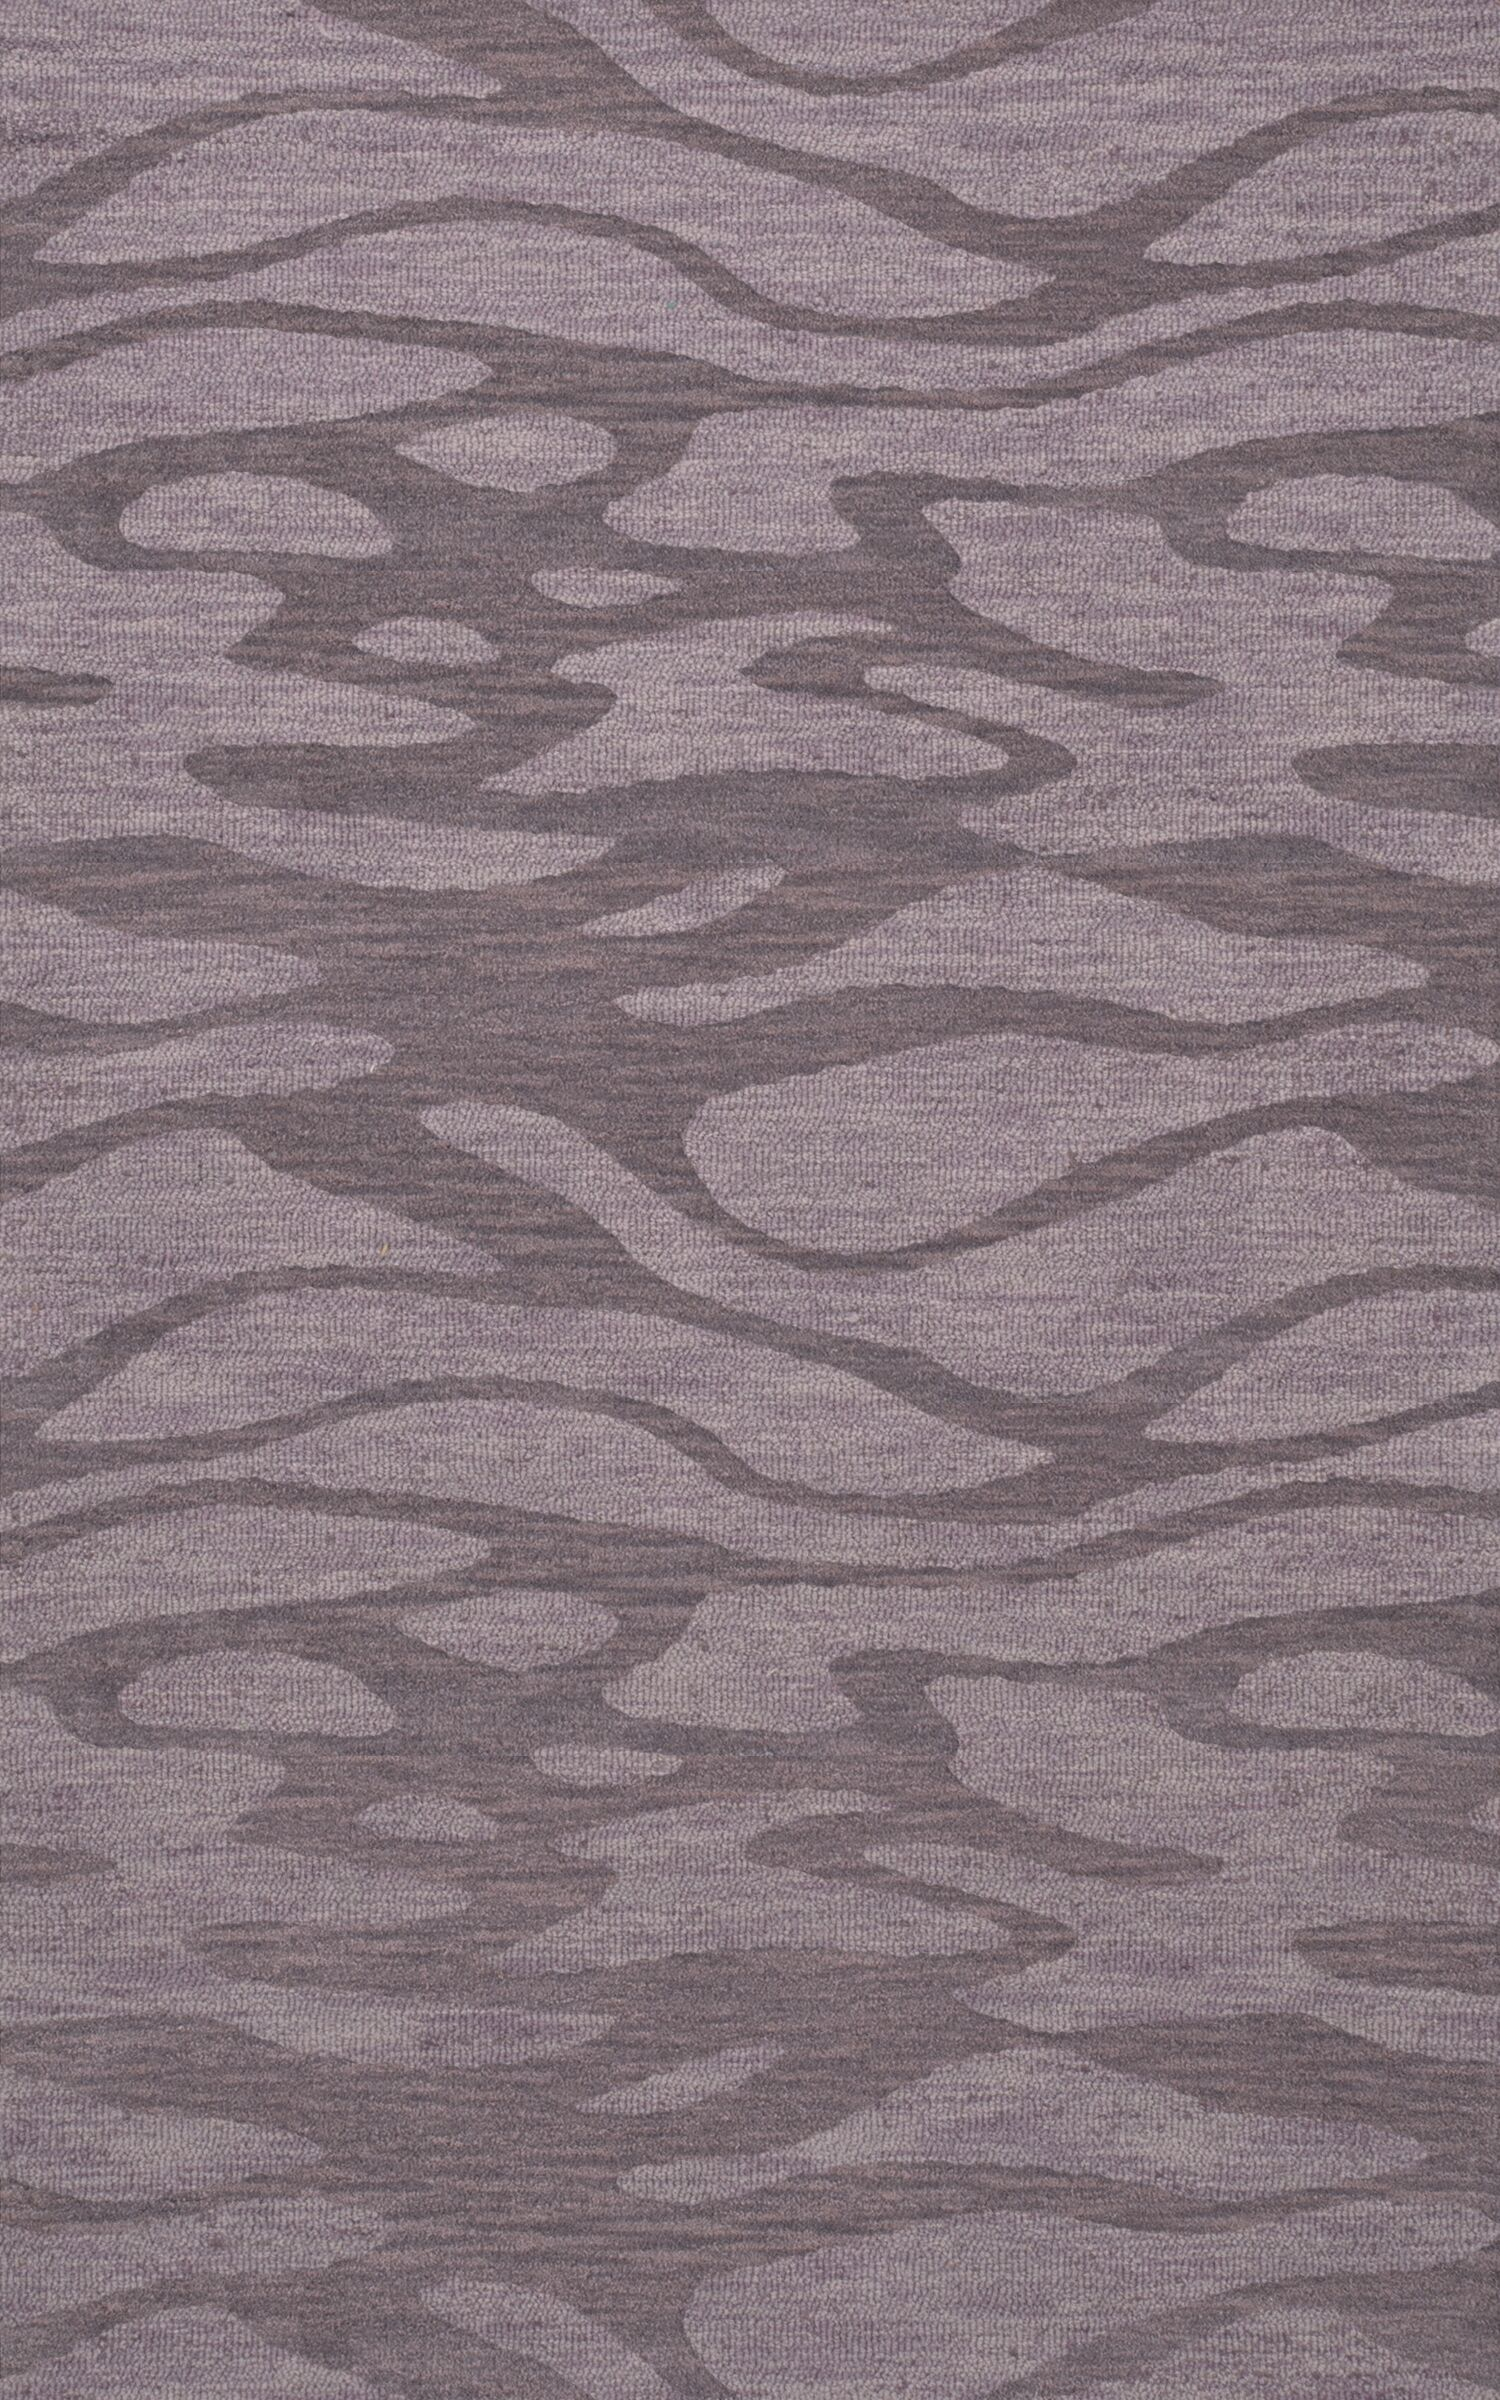 Bella Purple Area Rug Rug Size: Rectangle 5' x 8'